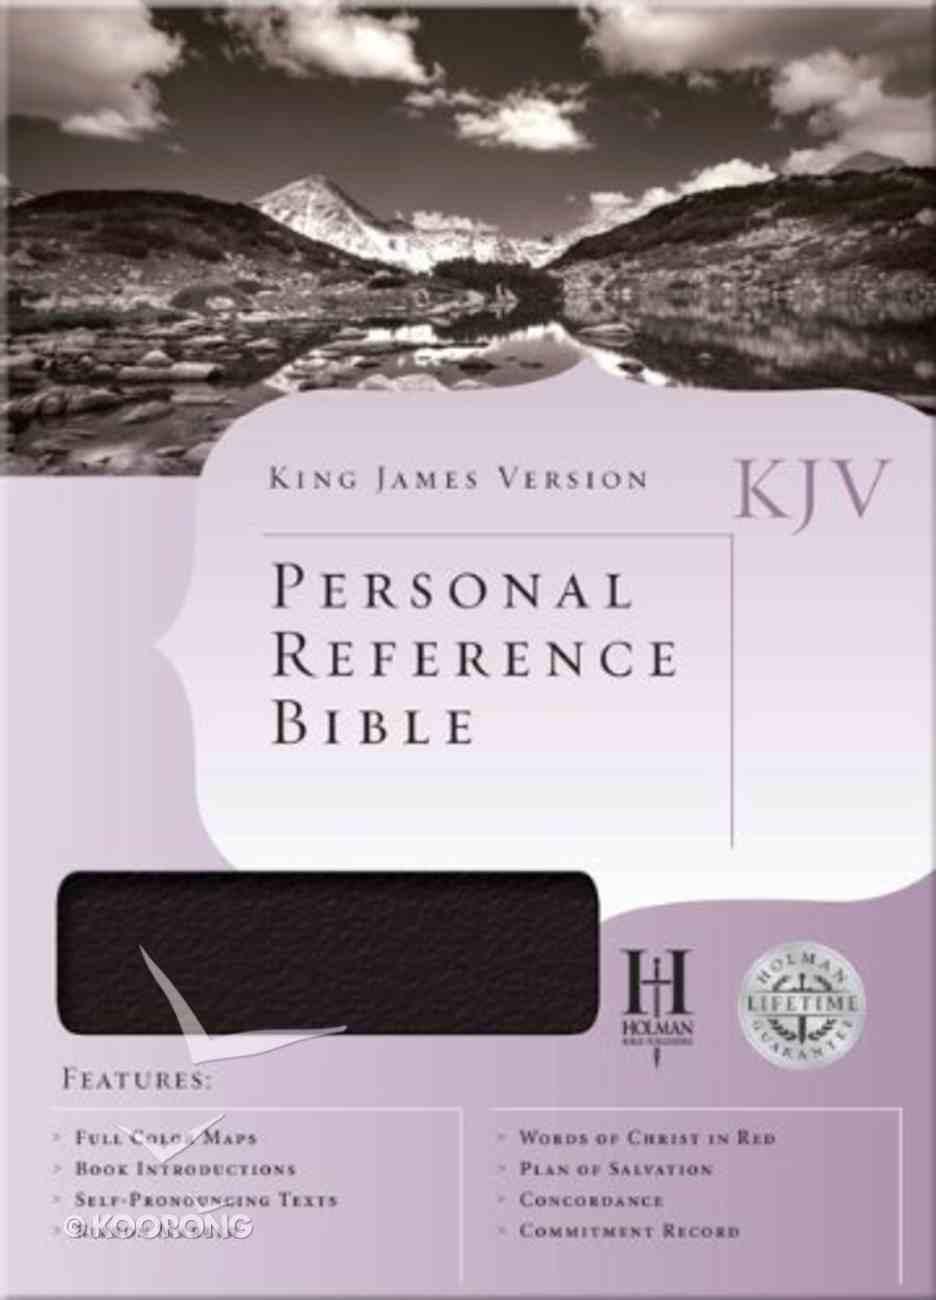 KJV Personal Reference Bible Black Bonded Leather